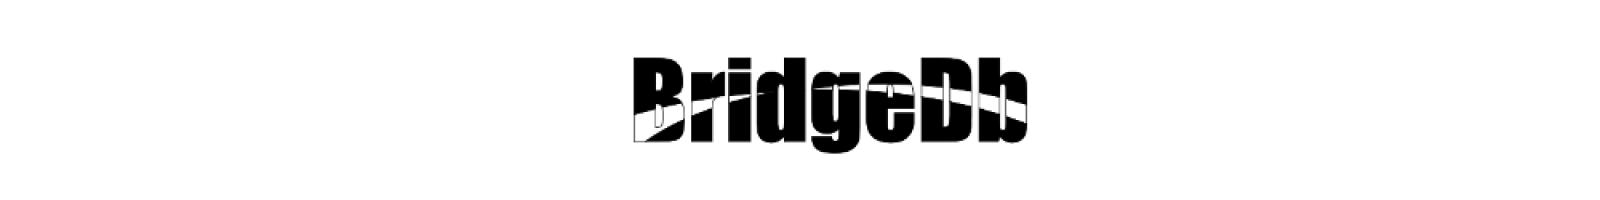 BridgeDb logo